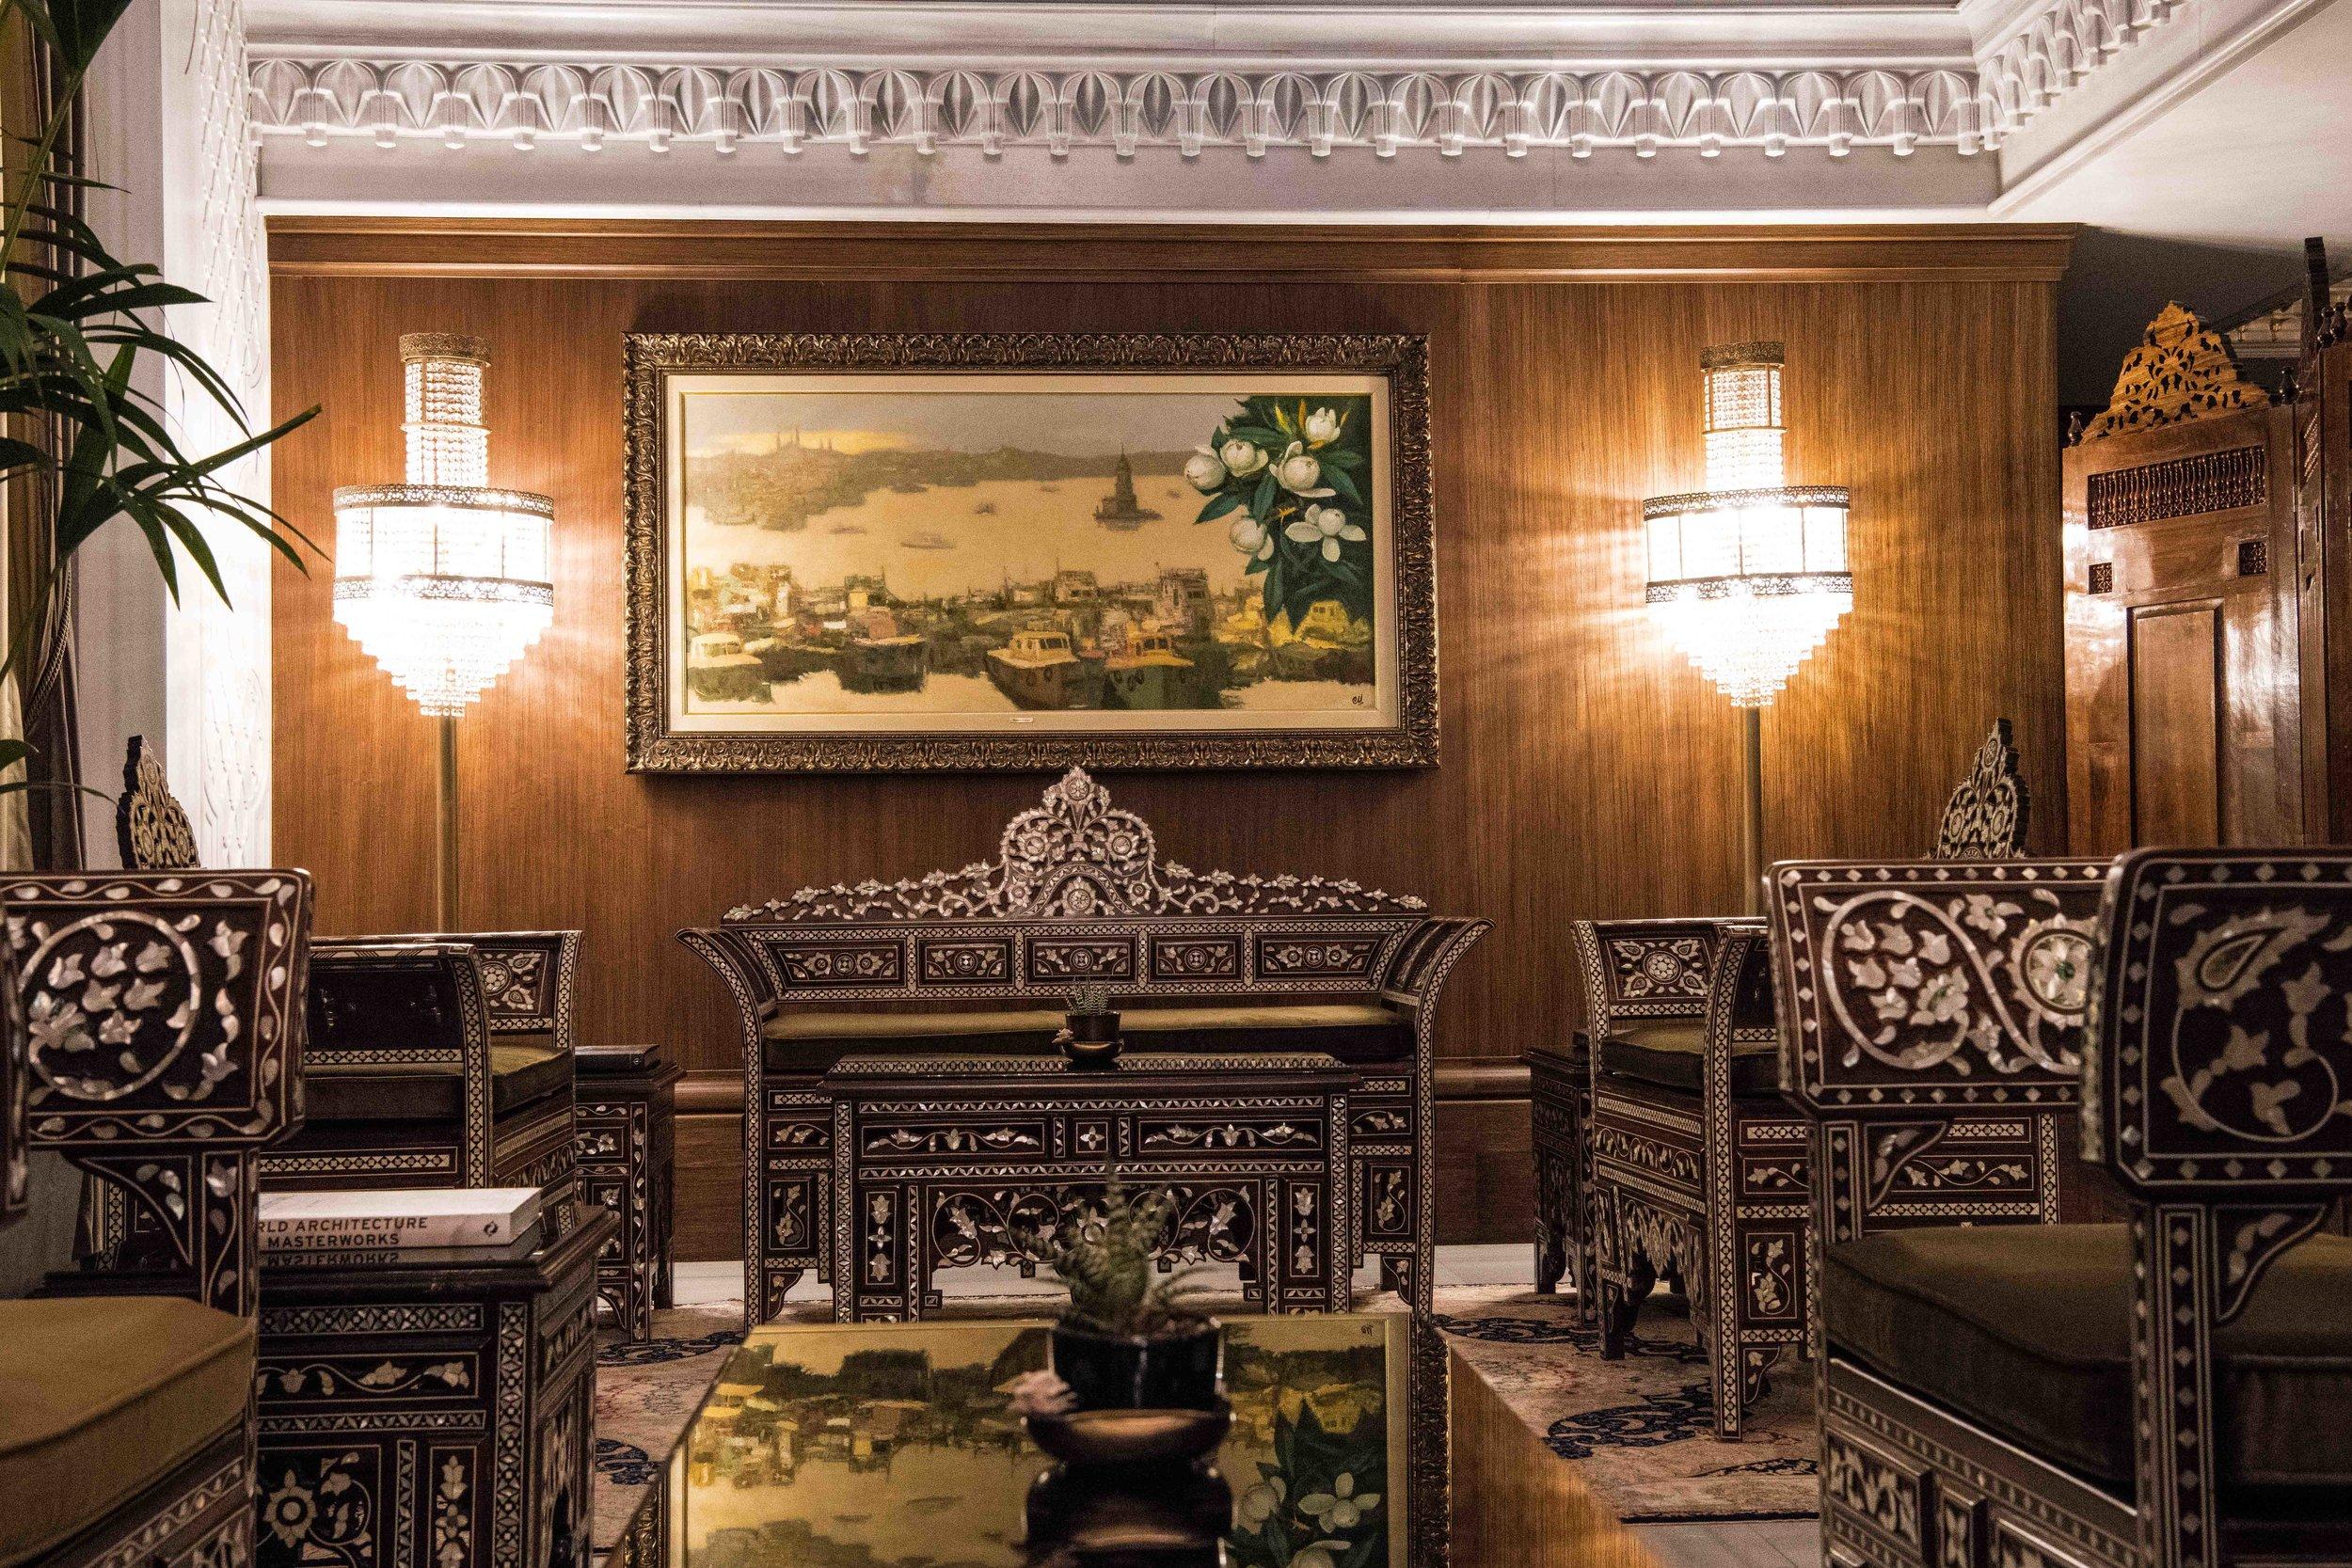 thetravelhub_istanbul_ajwa hotel-1271.jpg